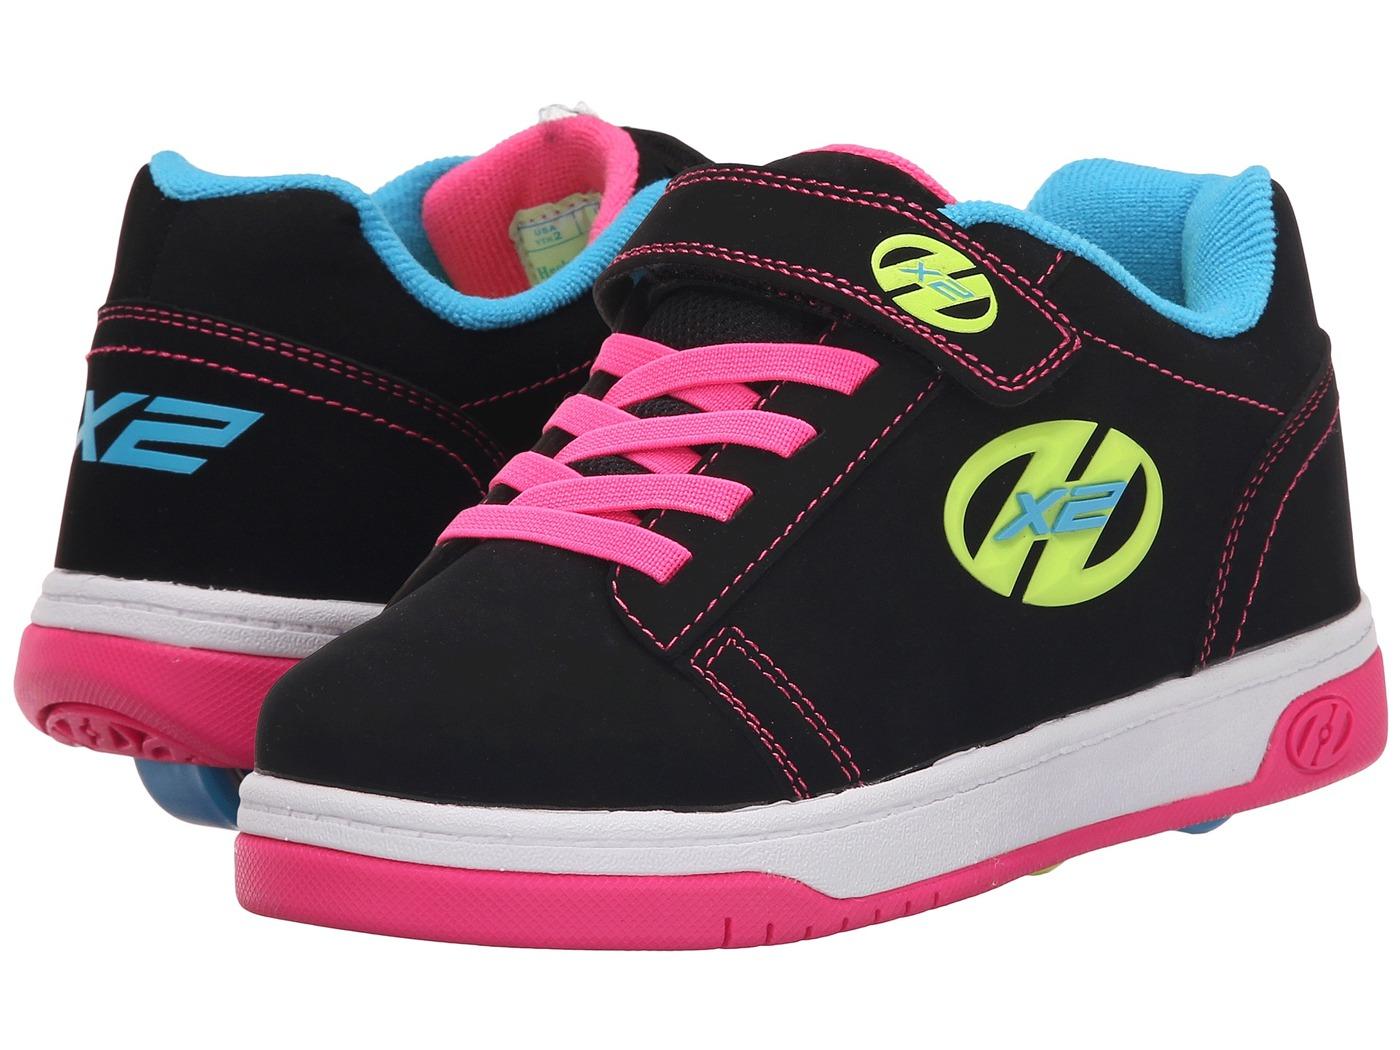 Roller shoes walmart - Roller Shoes Walmart 44